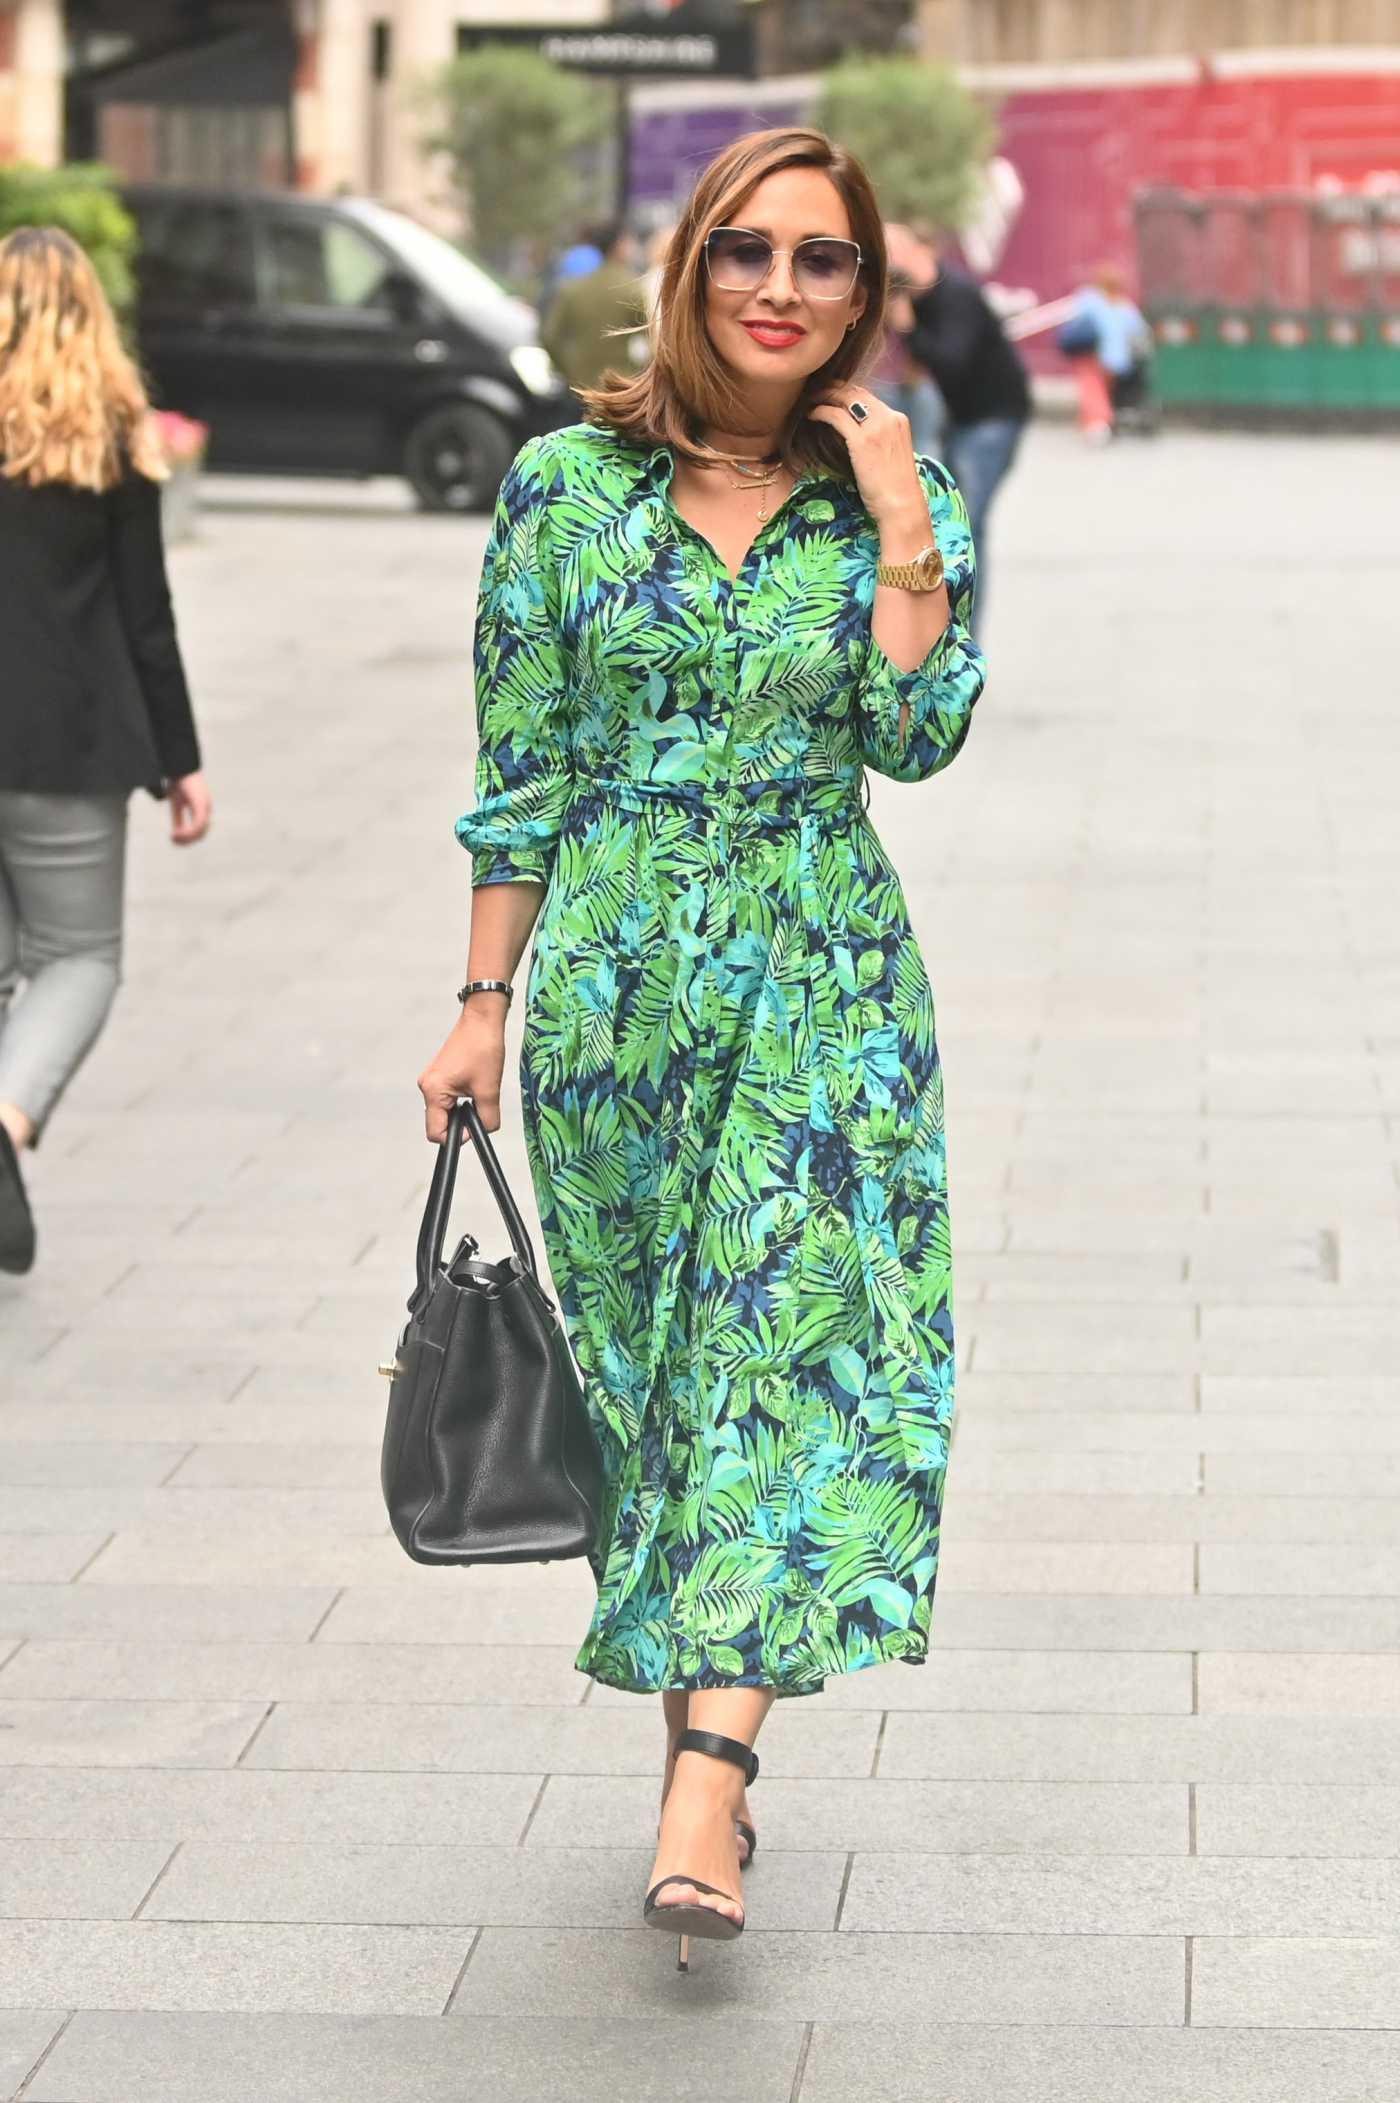 Myleene Klass in a Green Dress Leaves the Global Radio in London 08/16/2021